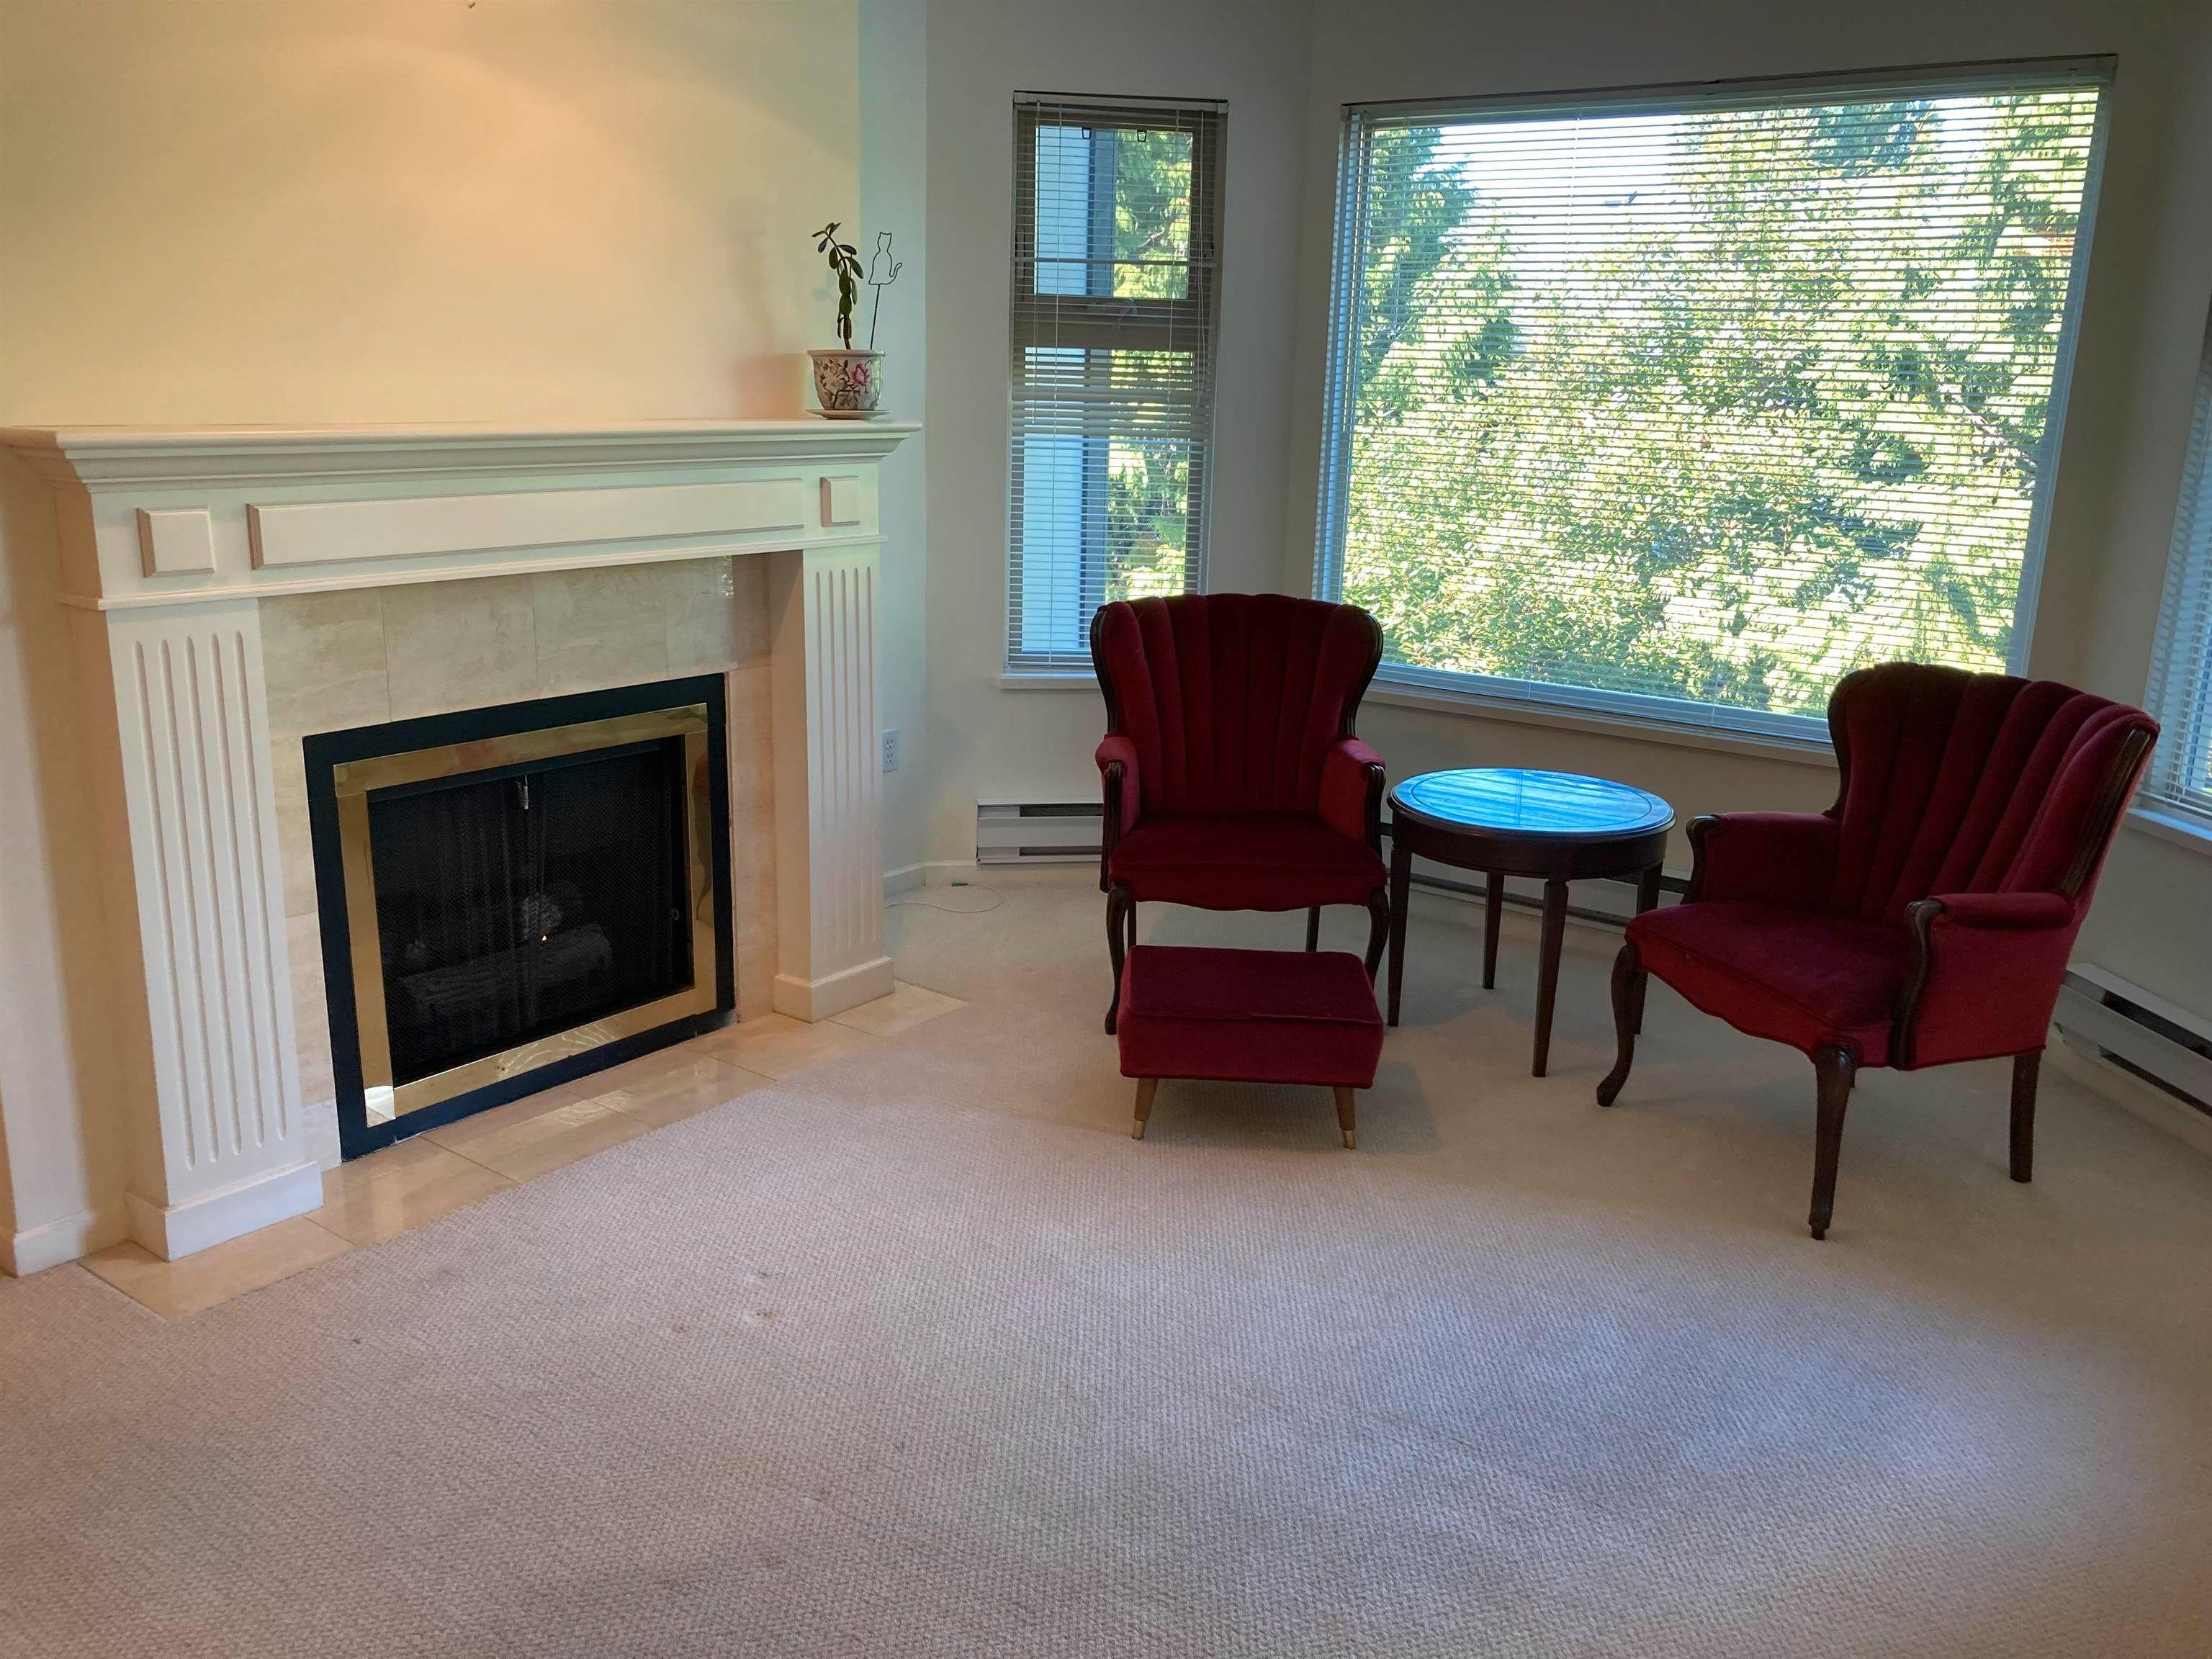 "Main Photo: D205 4845 53 Street in Delta: Hawthorne Condo for sale in ""LADNER POINTE"" (Ladner)  : MLS®# R2616238"